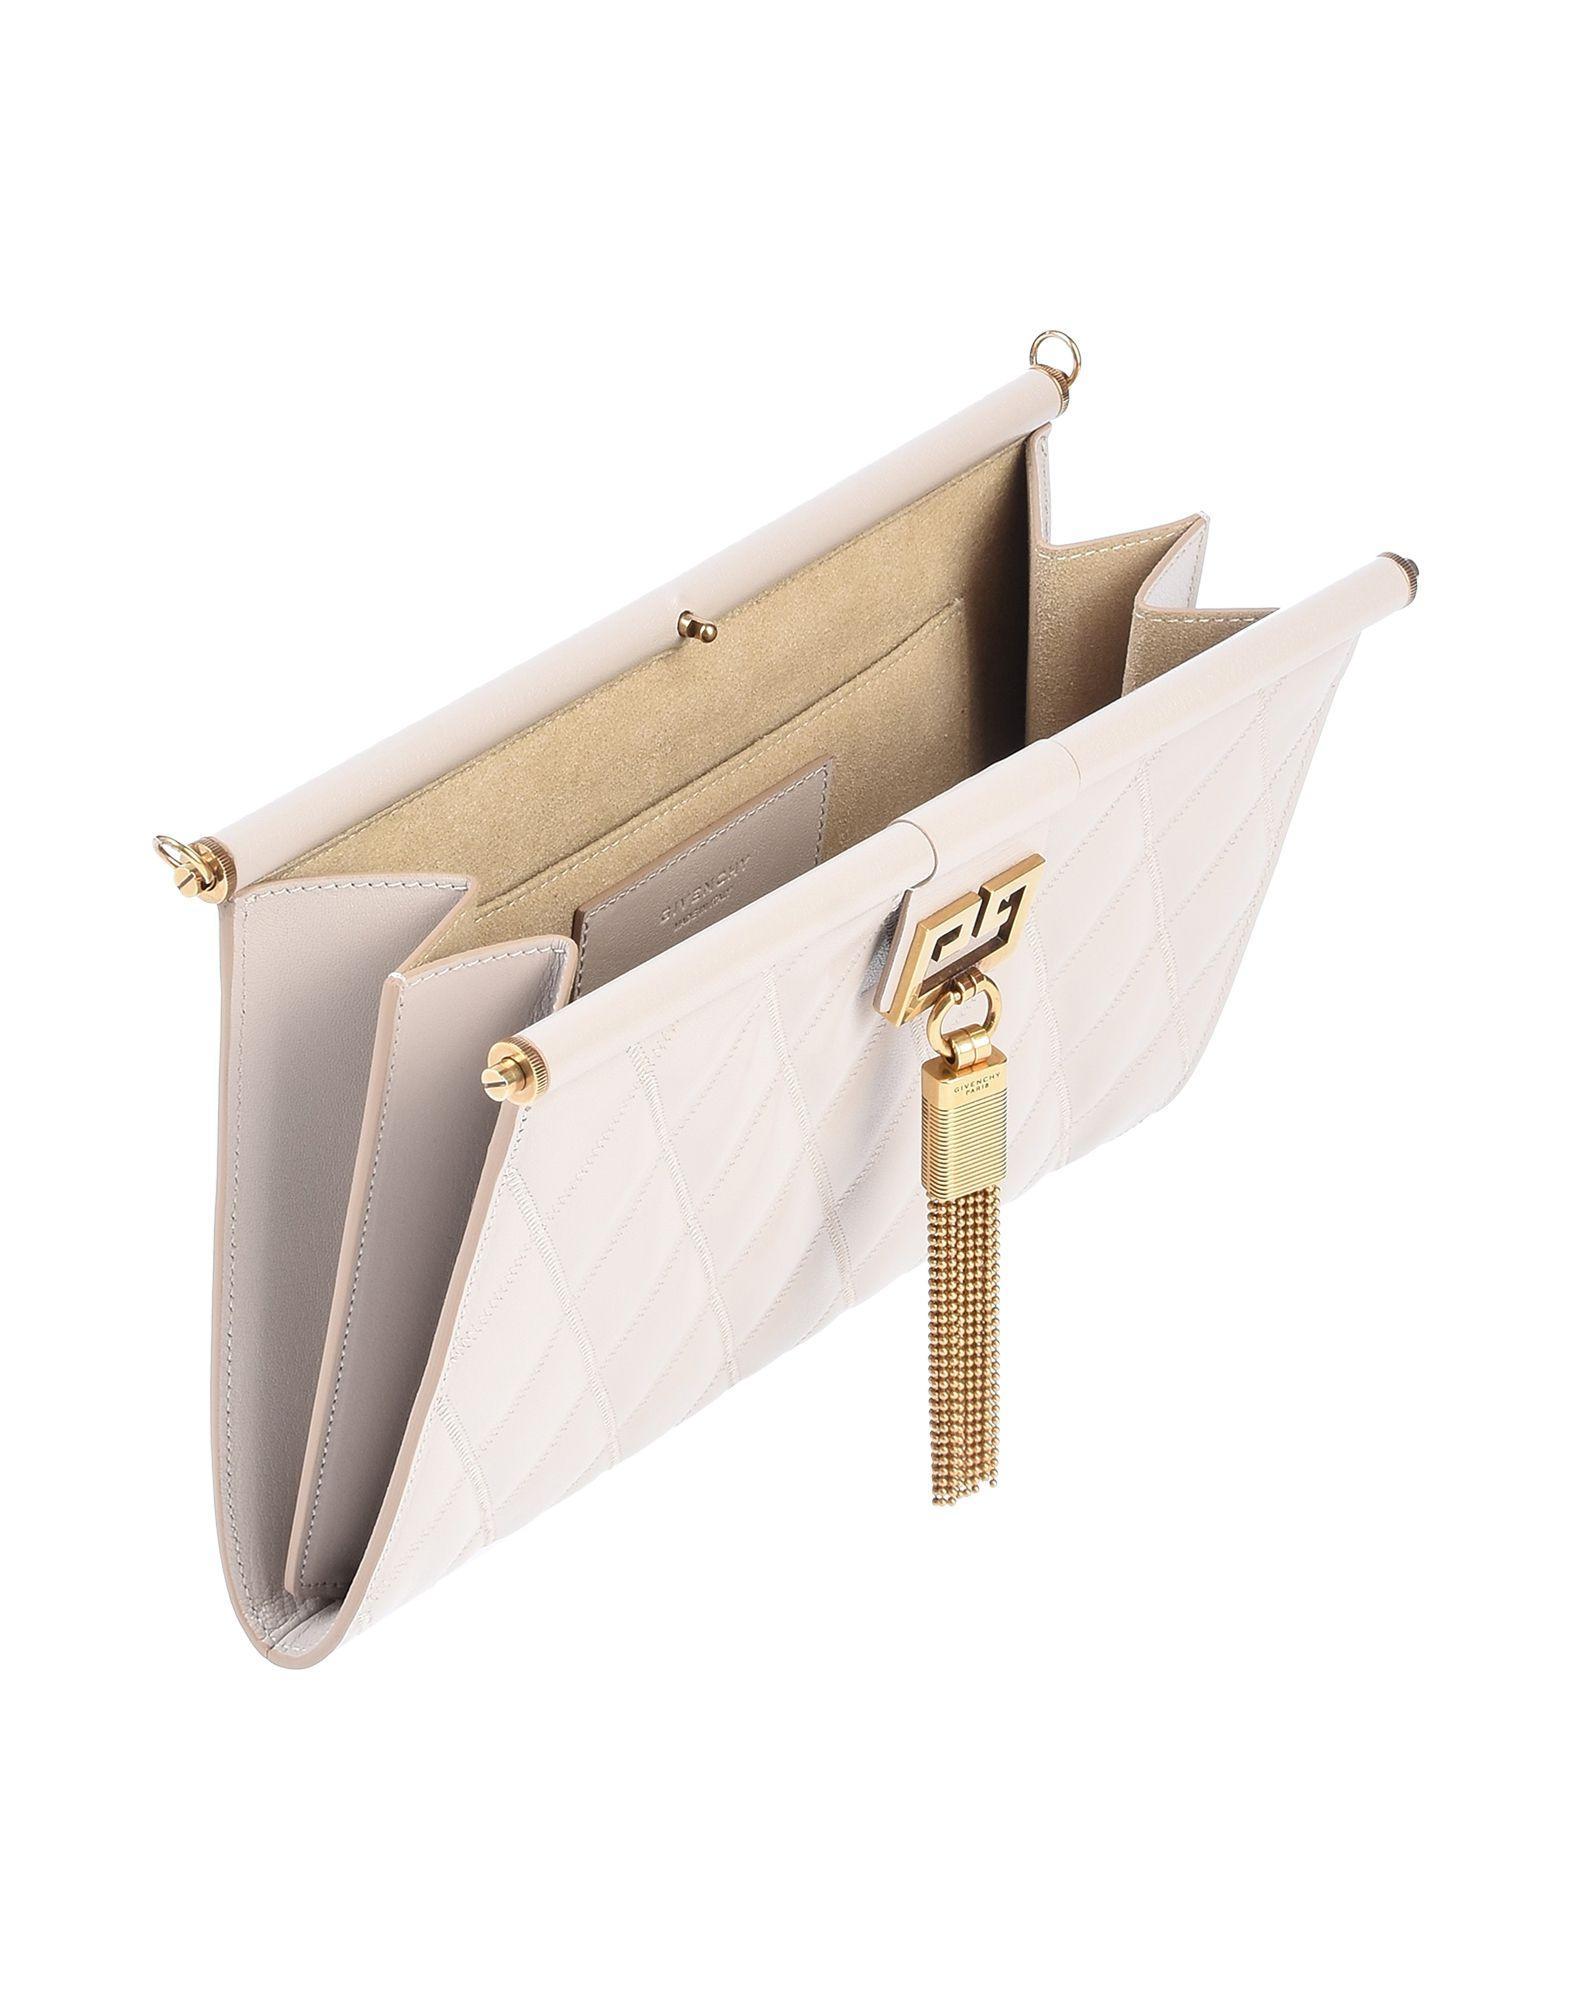 Givenchy Leder Handtaschen in Grau uKzCR